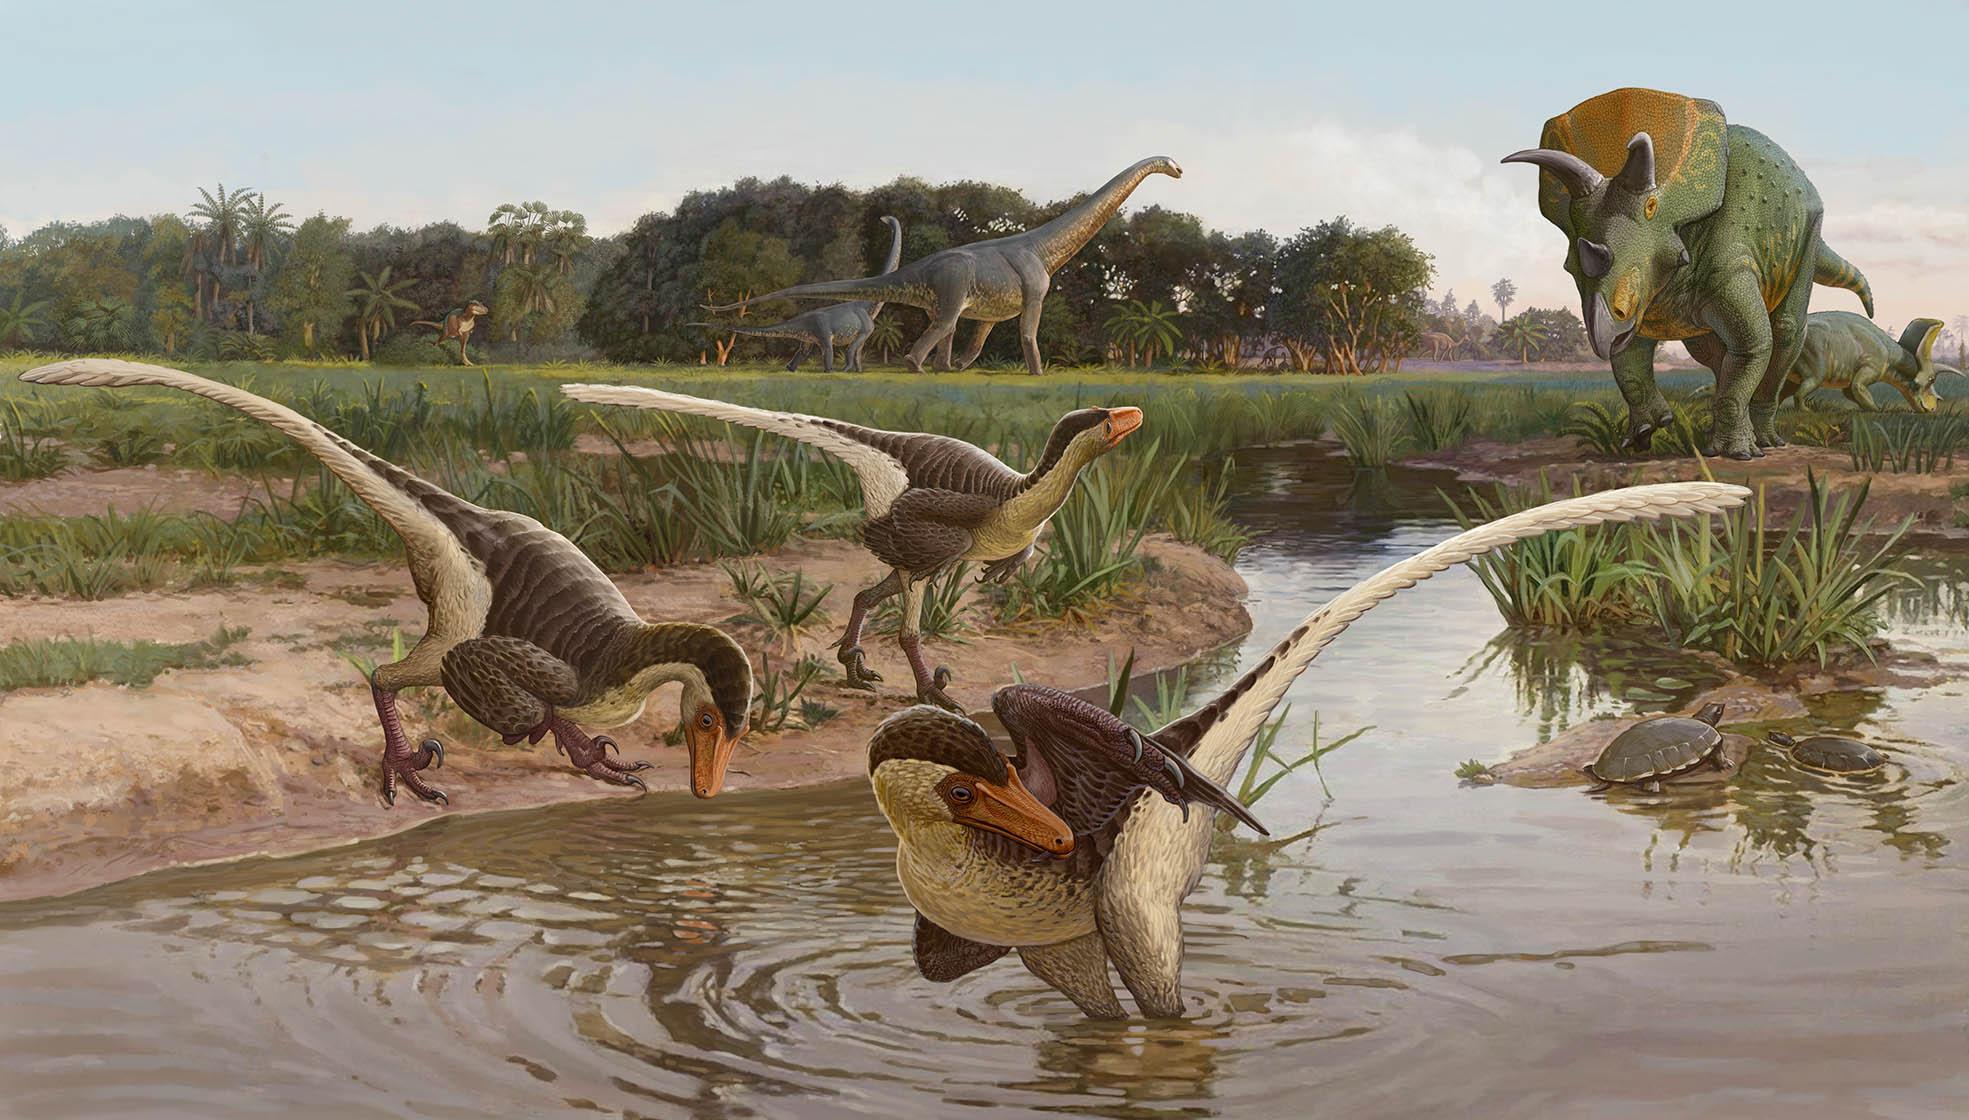 the newly discovered dinosaur: Dineobellator notohesperus